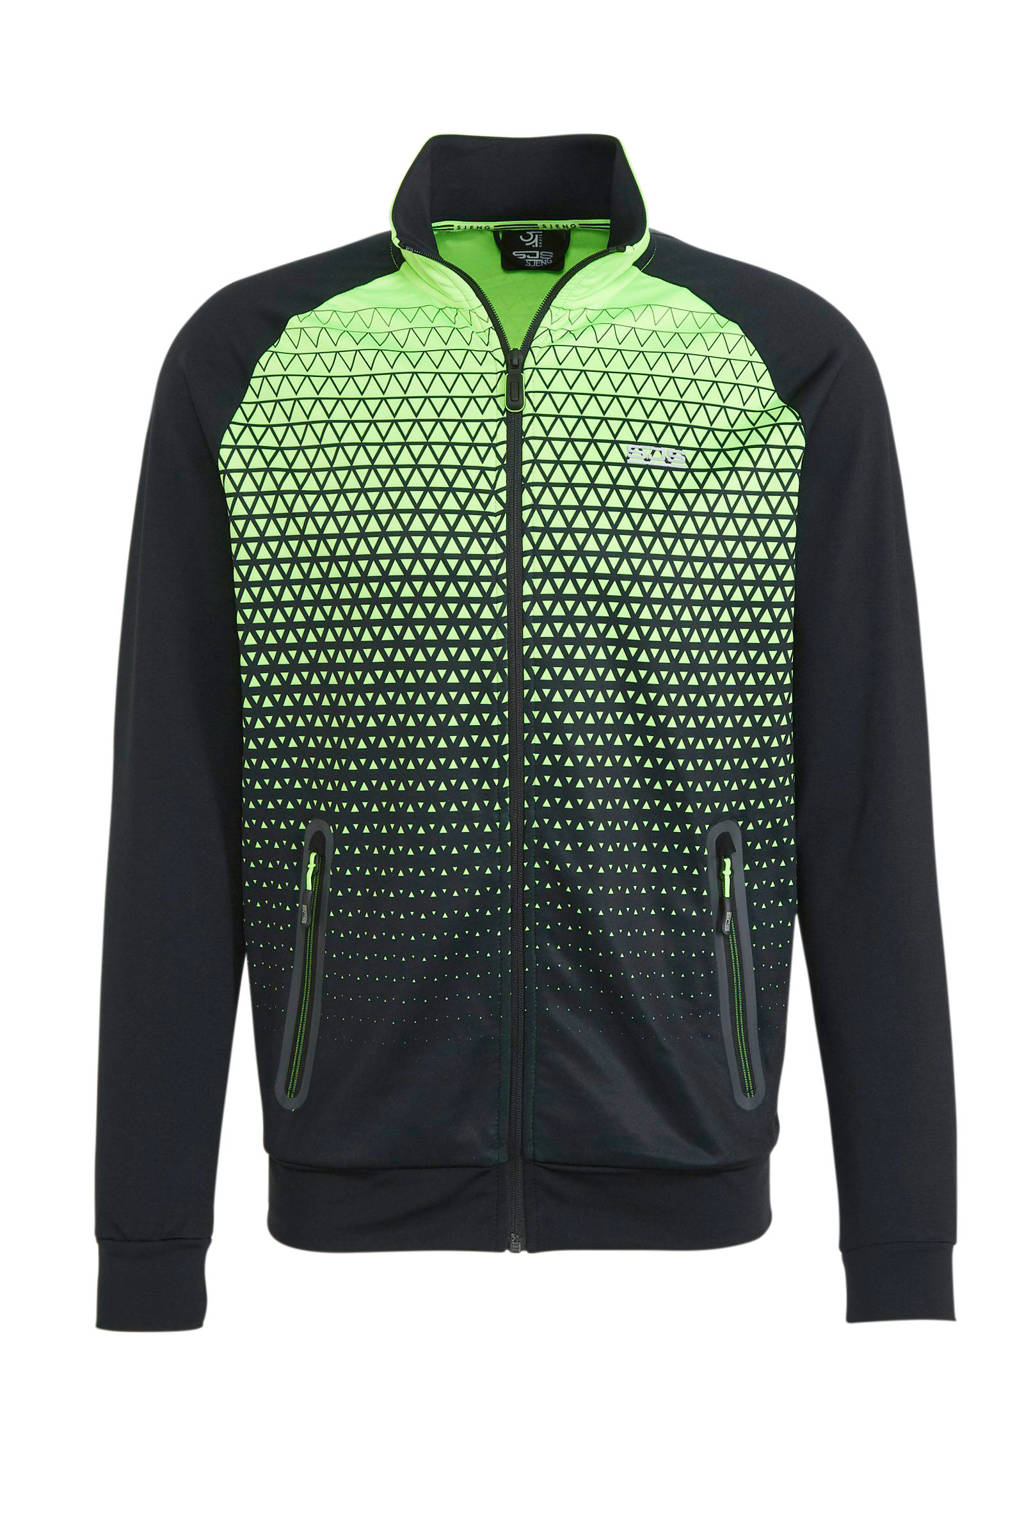 Sjeng Sports   vest Kingsley zwart/groen, Zwart/groen